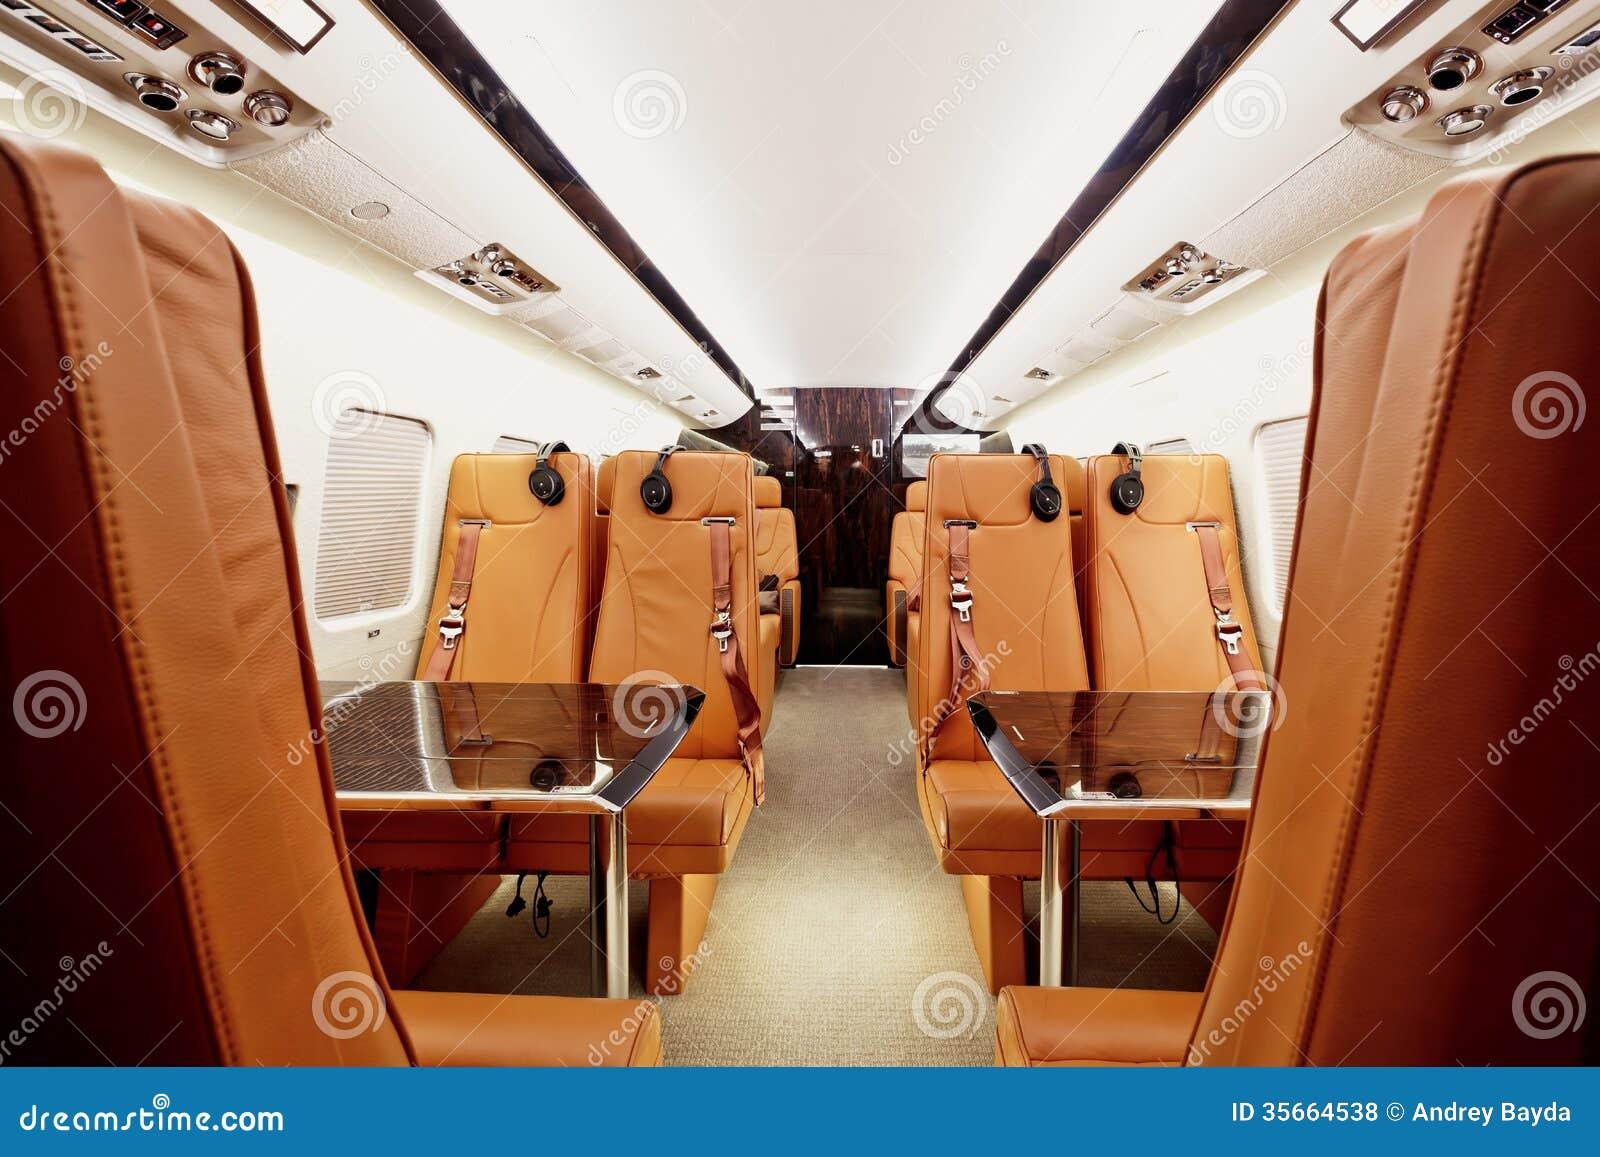 private plane interior stock photo image of light machine 35664538